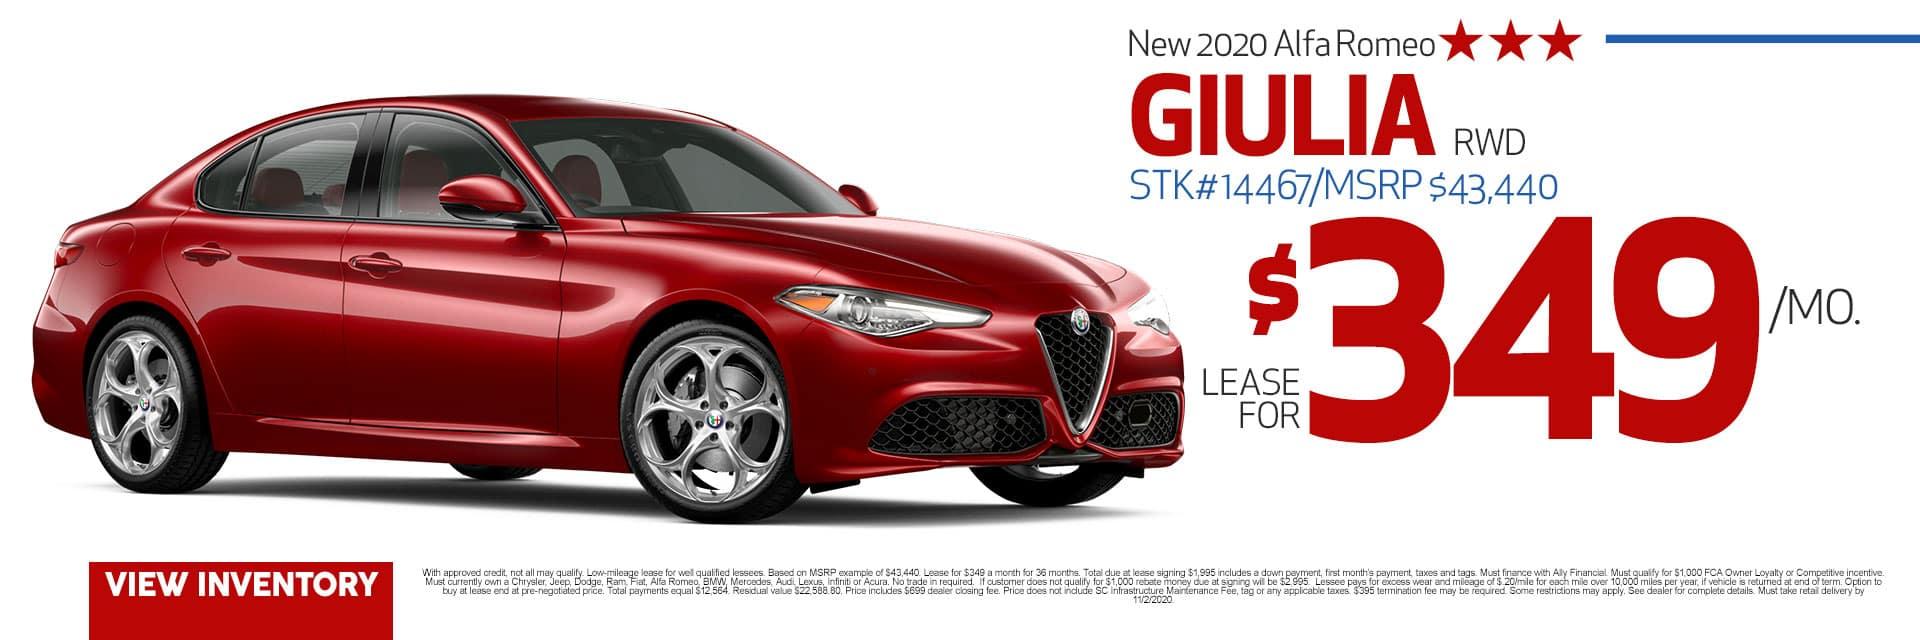 SLAM80451-01-October-2020-Web-Campaign-Alfa-Romeo-Slides-giulia UPDATED